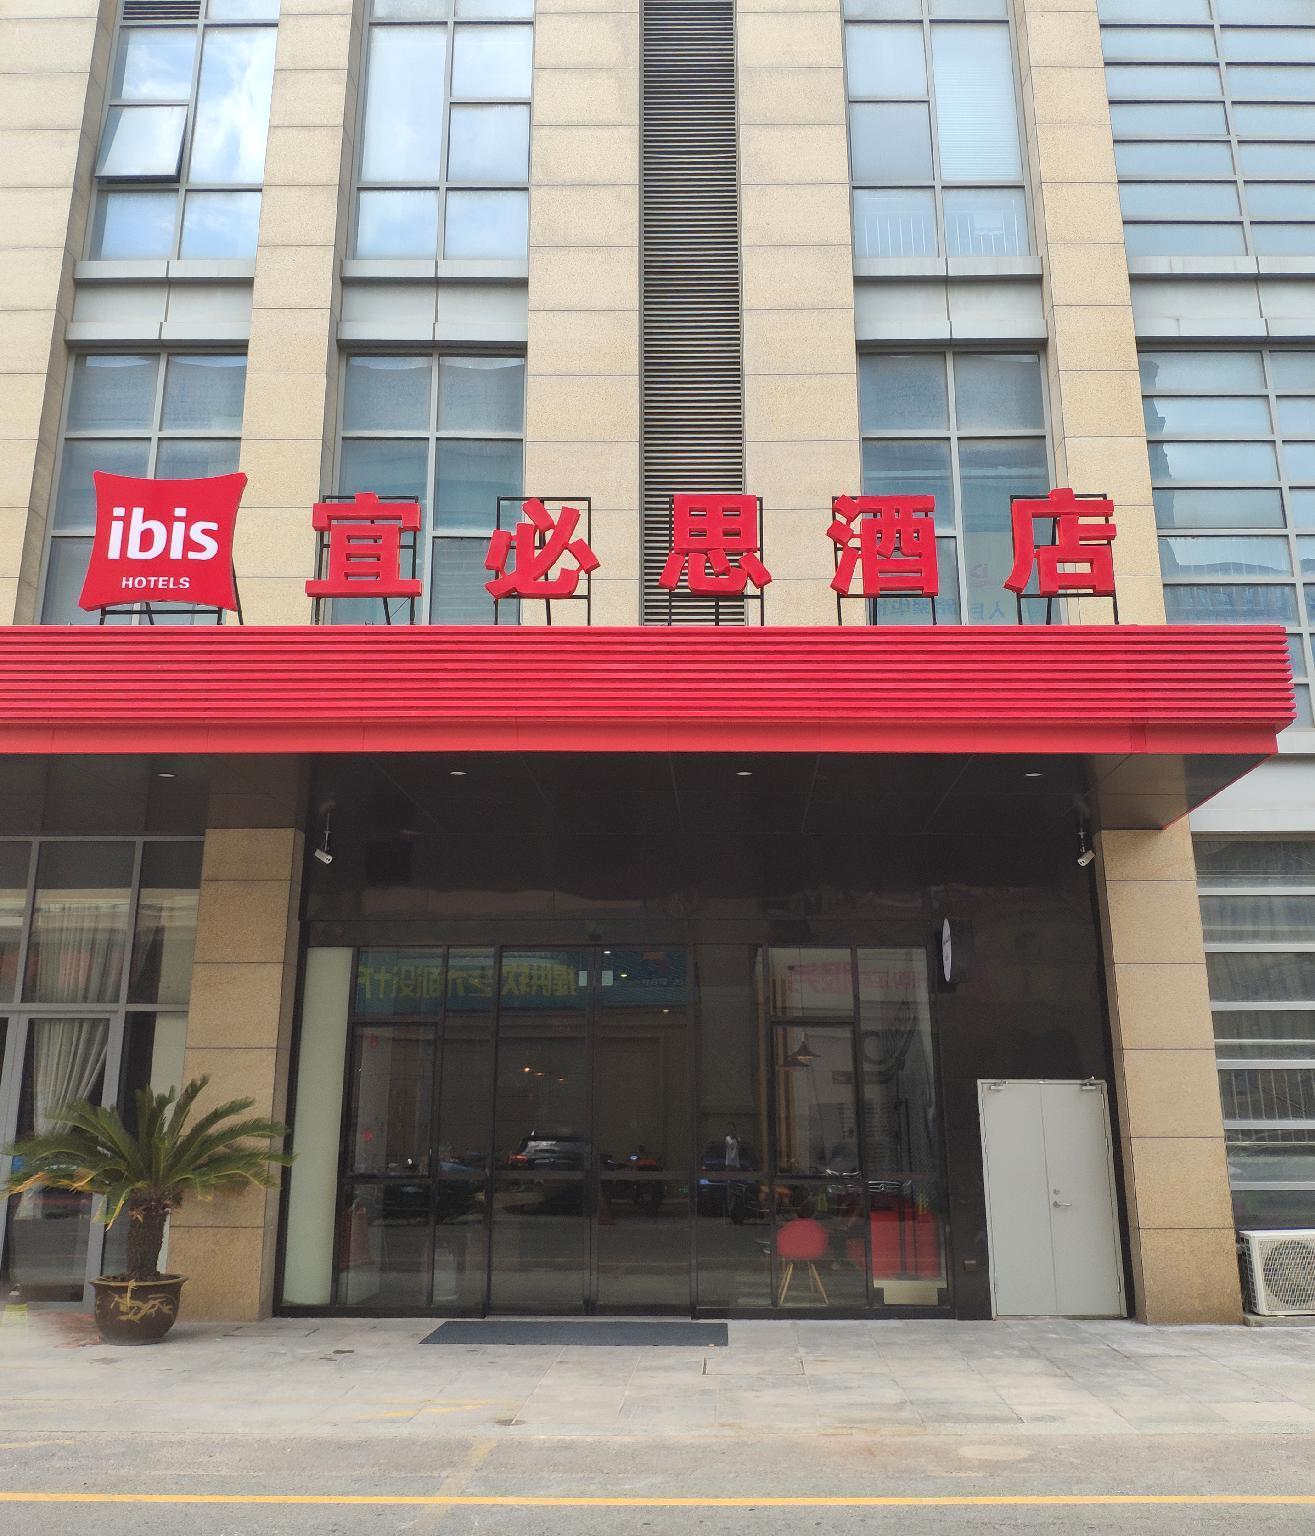 Ibis Nantong Middle Renmin Rd Hotel, Nantong